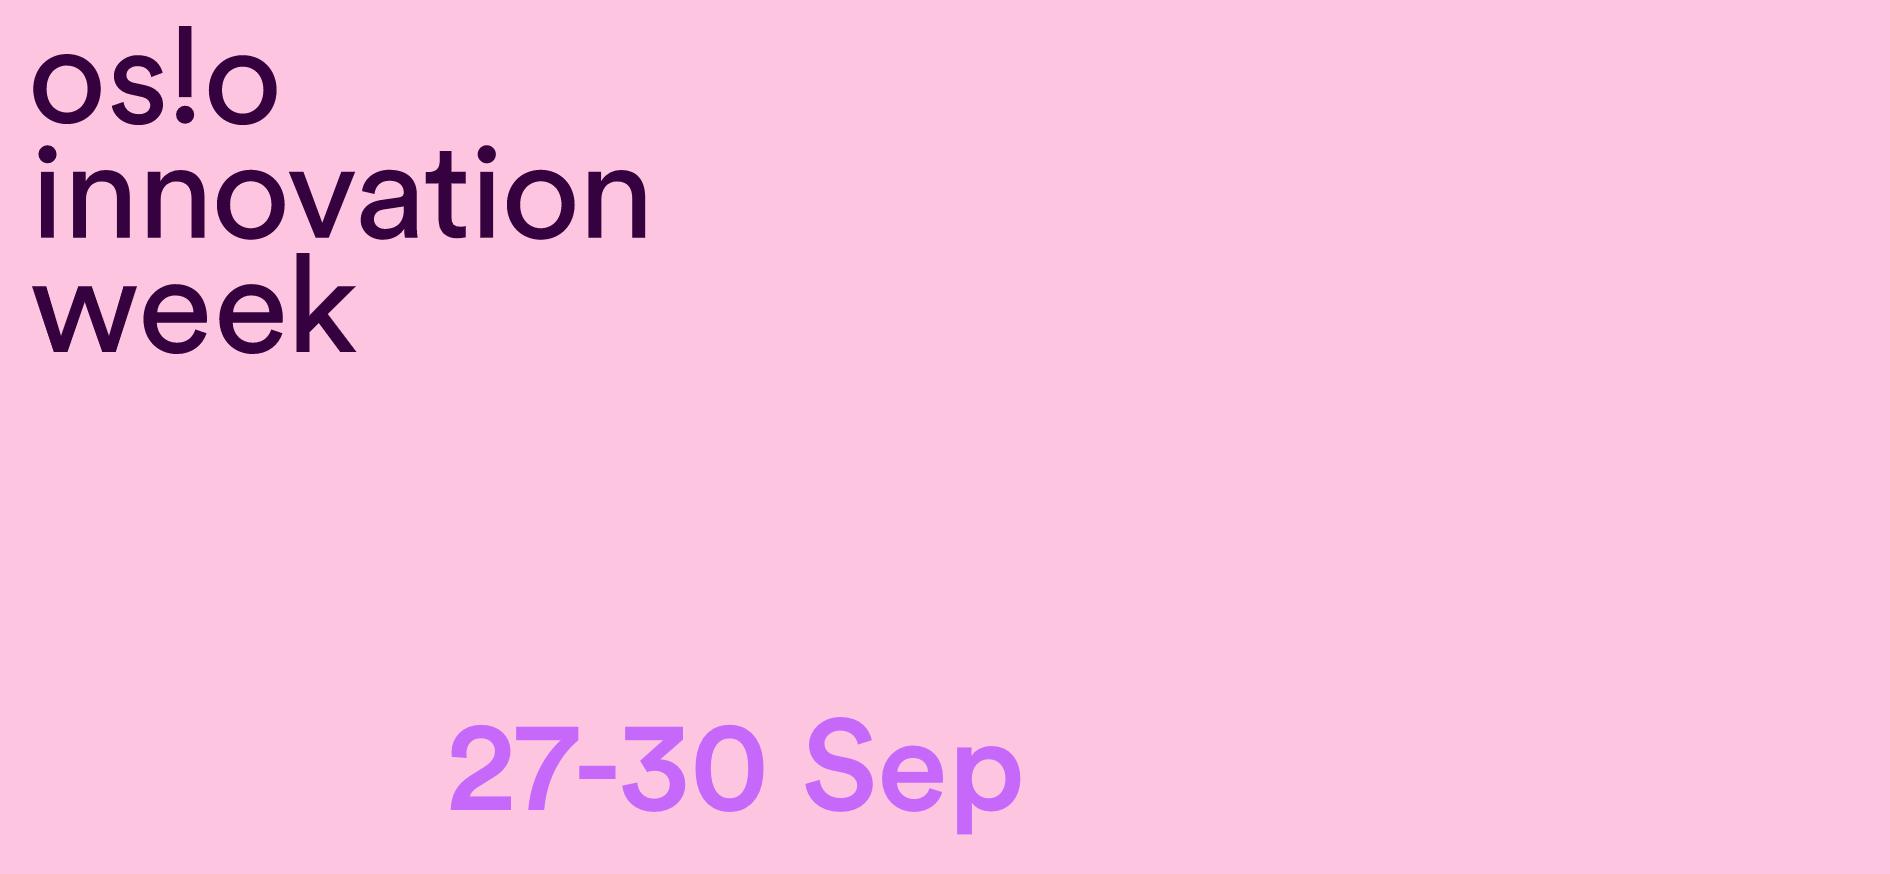 Oslo Innovation Week 2021